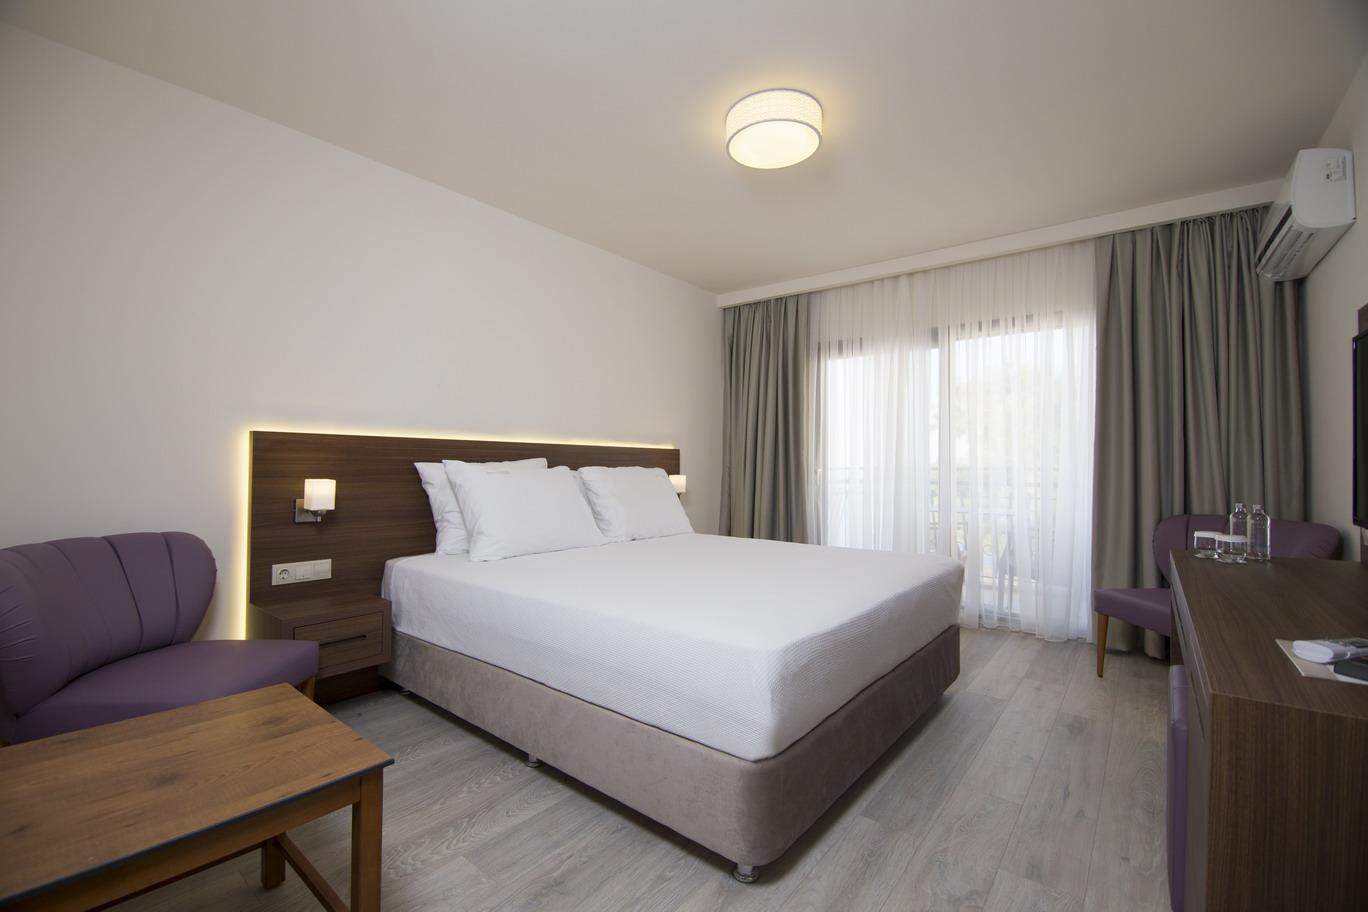 NEOPOL HOTEL (EX VENTI HOTEL LUXURY)